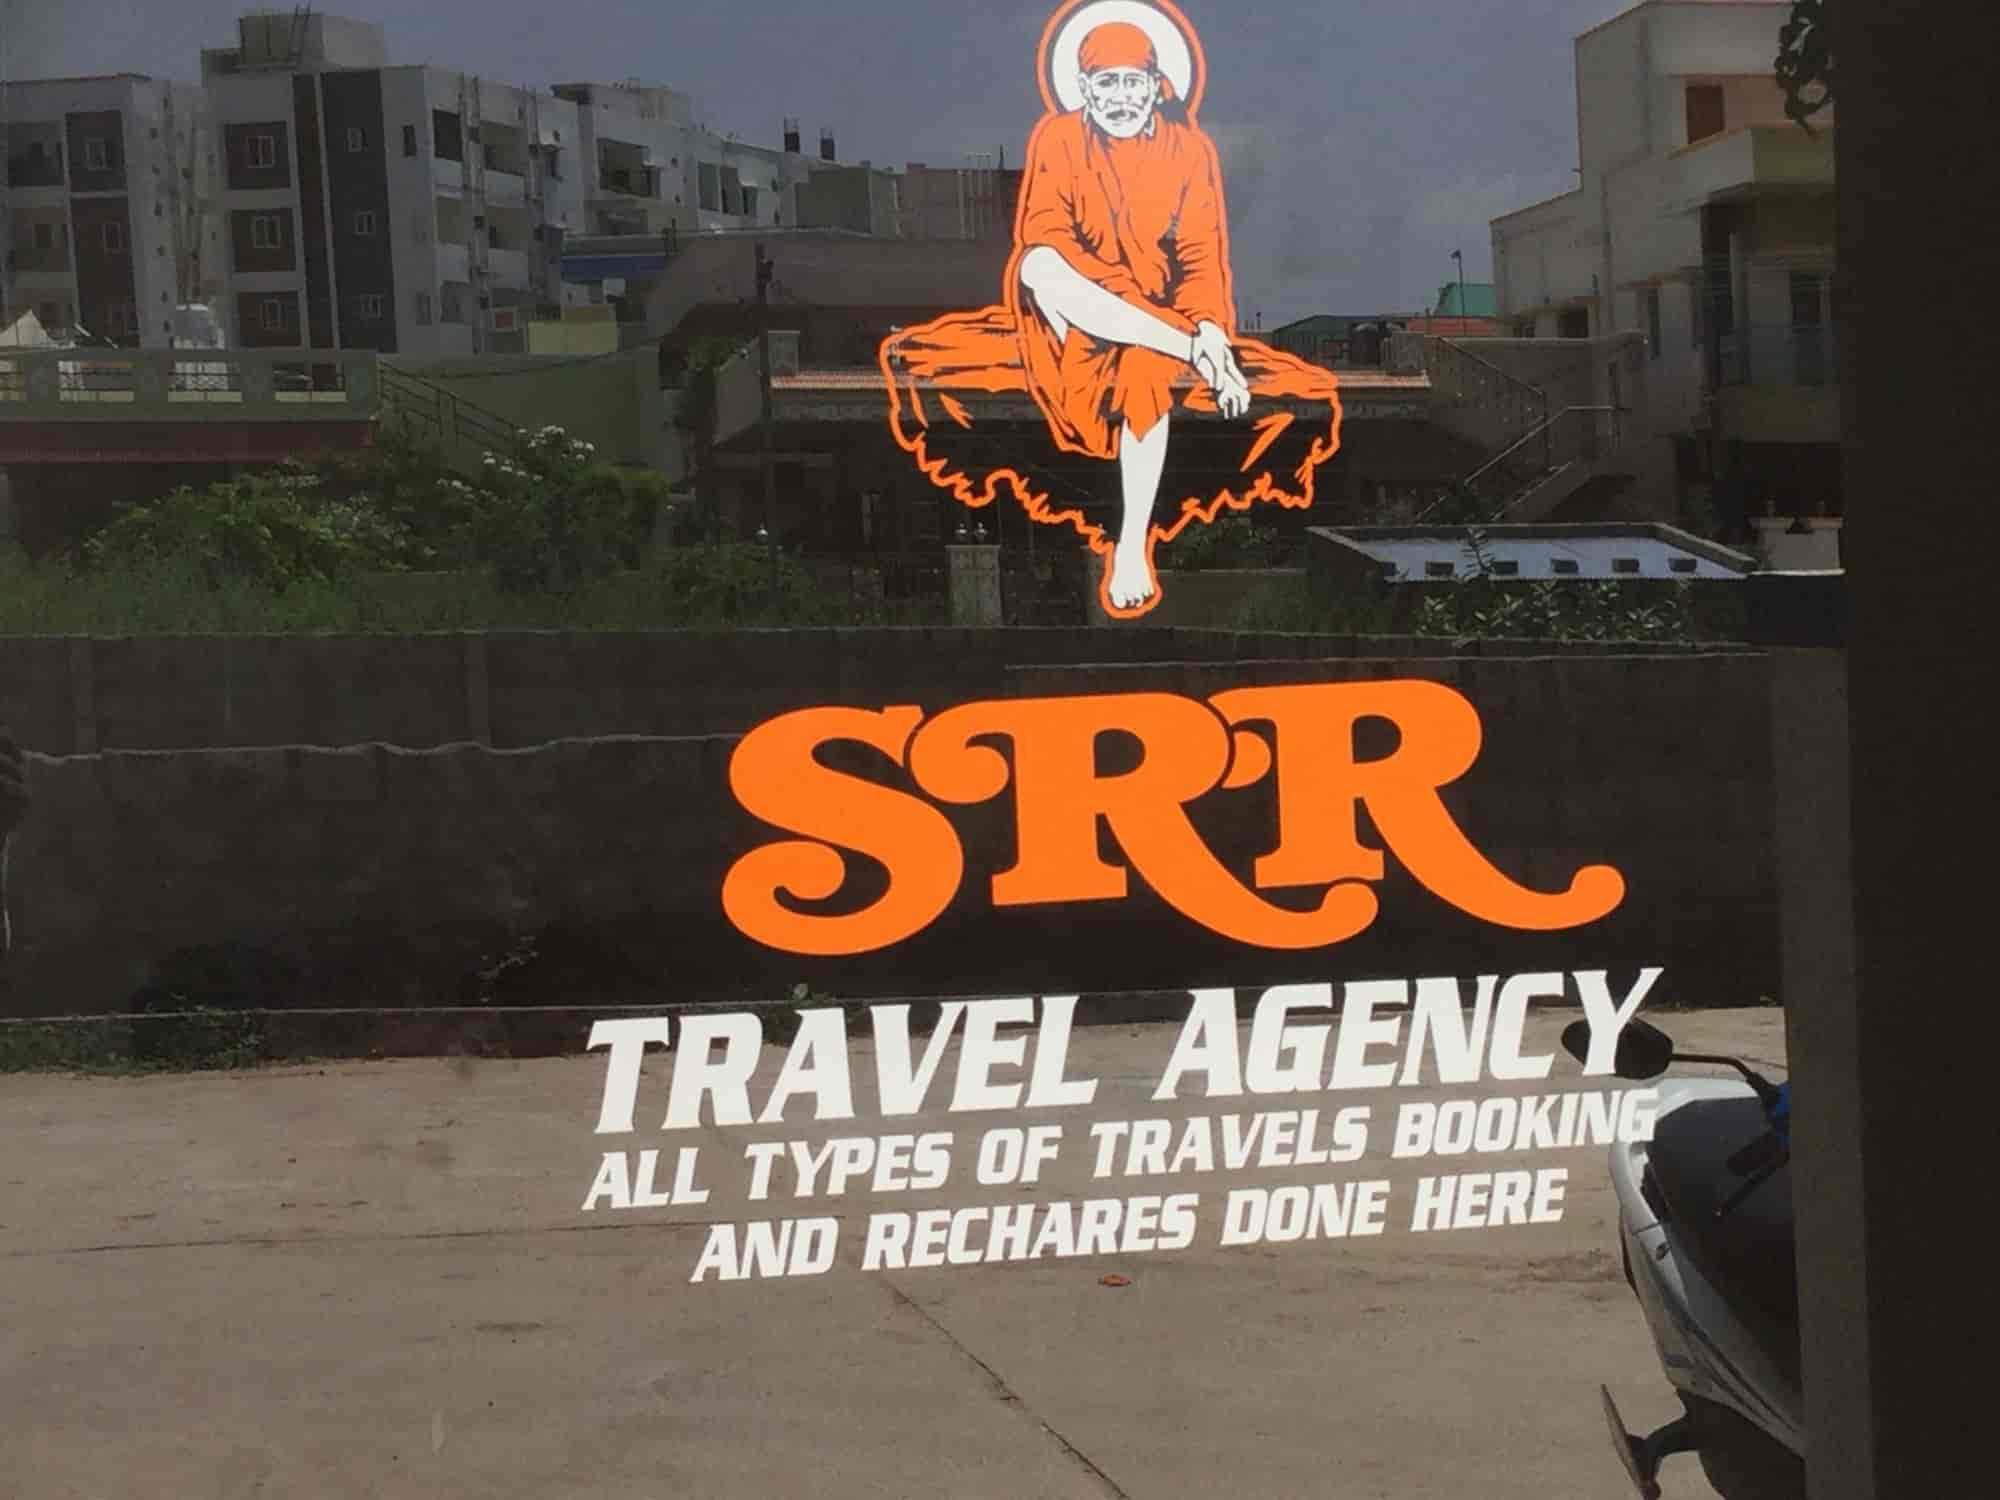 SRR Travel Agency, Kattamanchi - Travel Agents in Chittoor